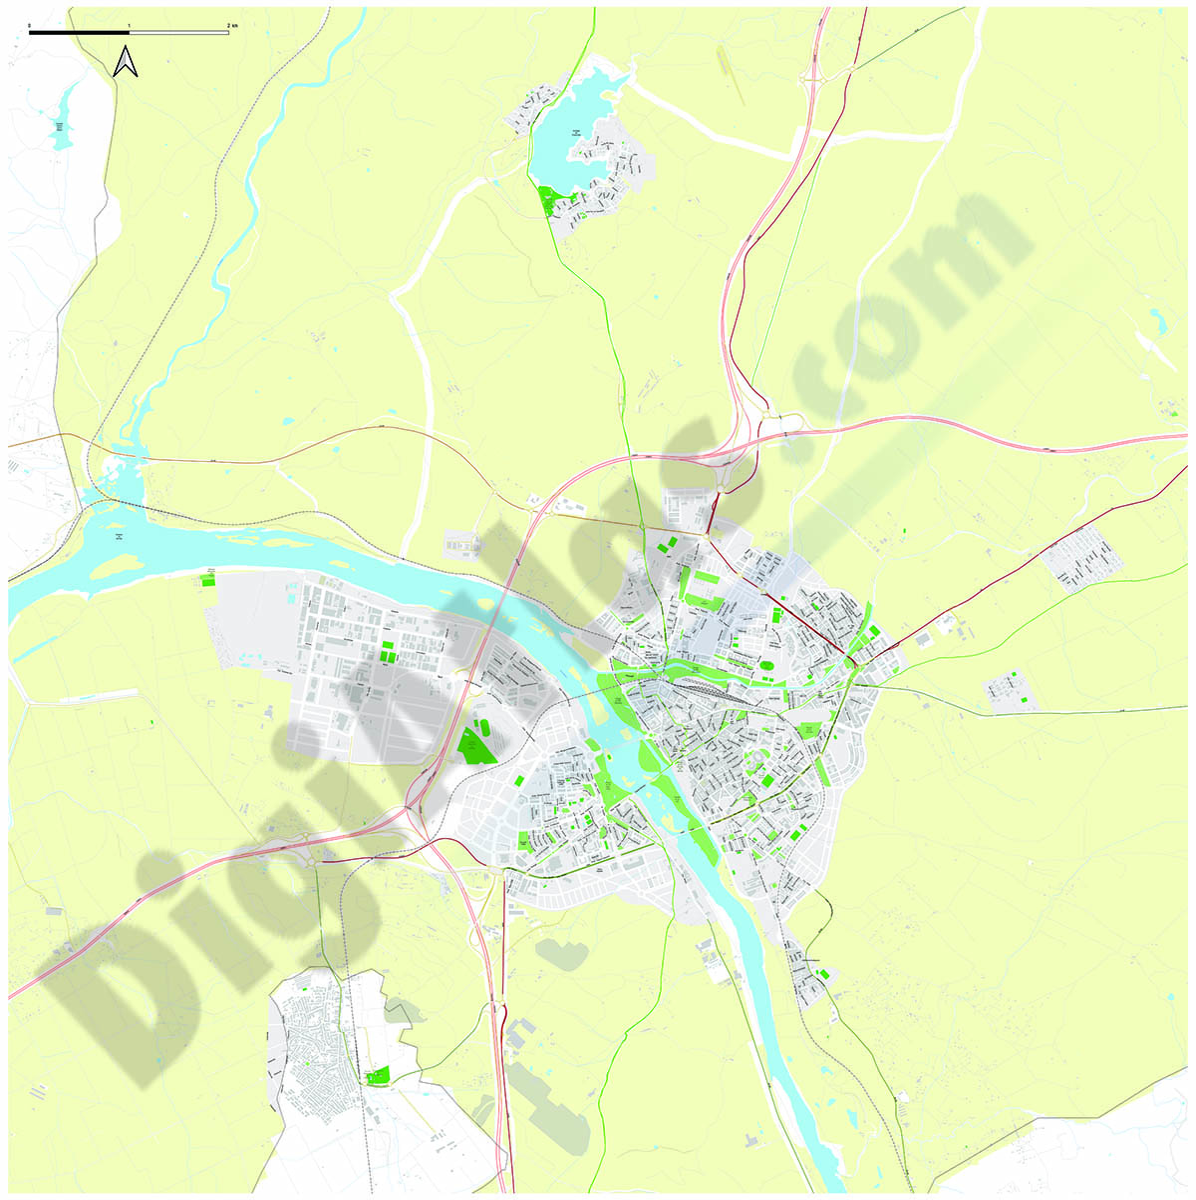 Mérida - plano area urbana